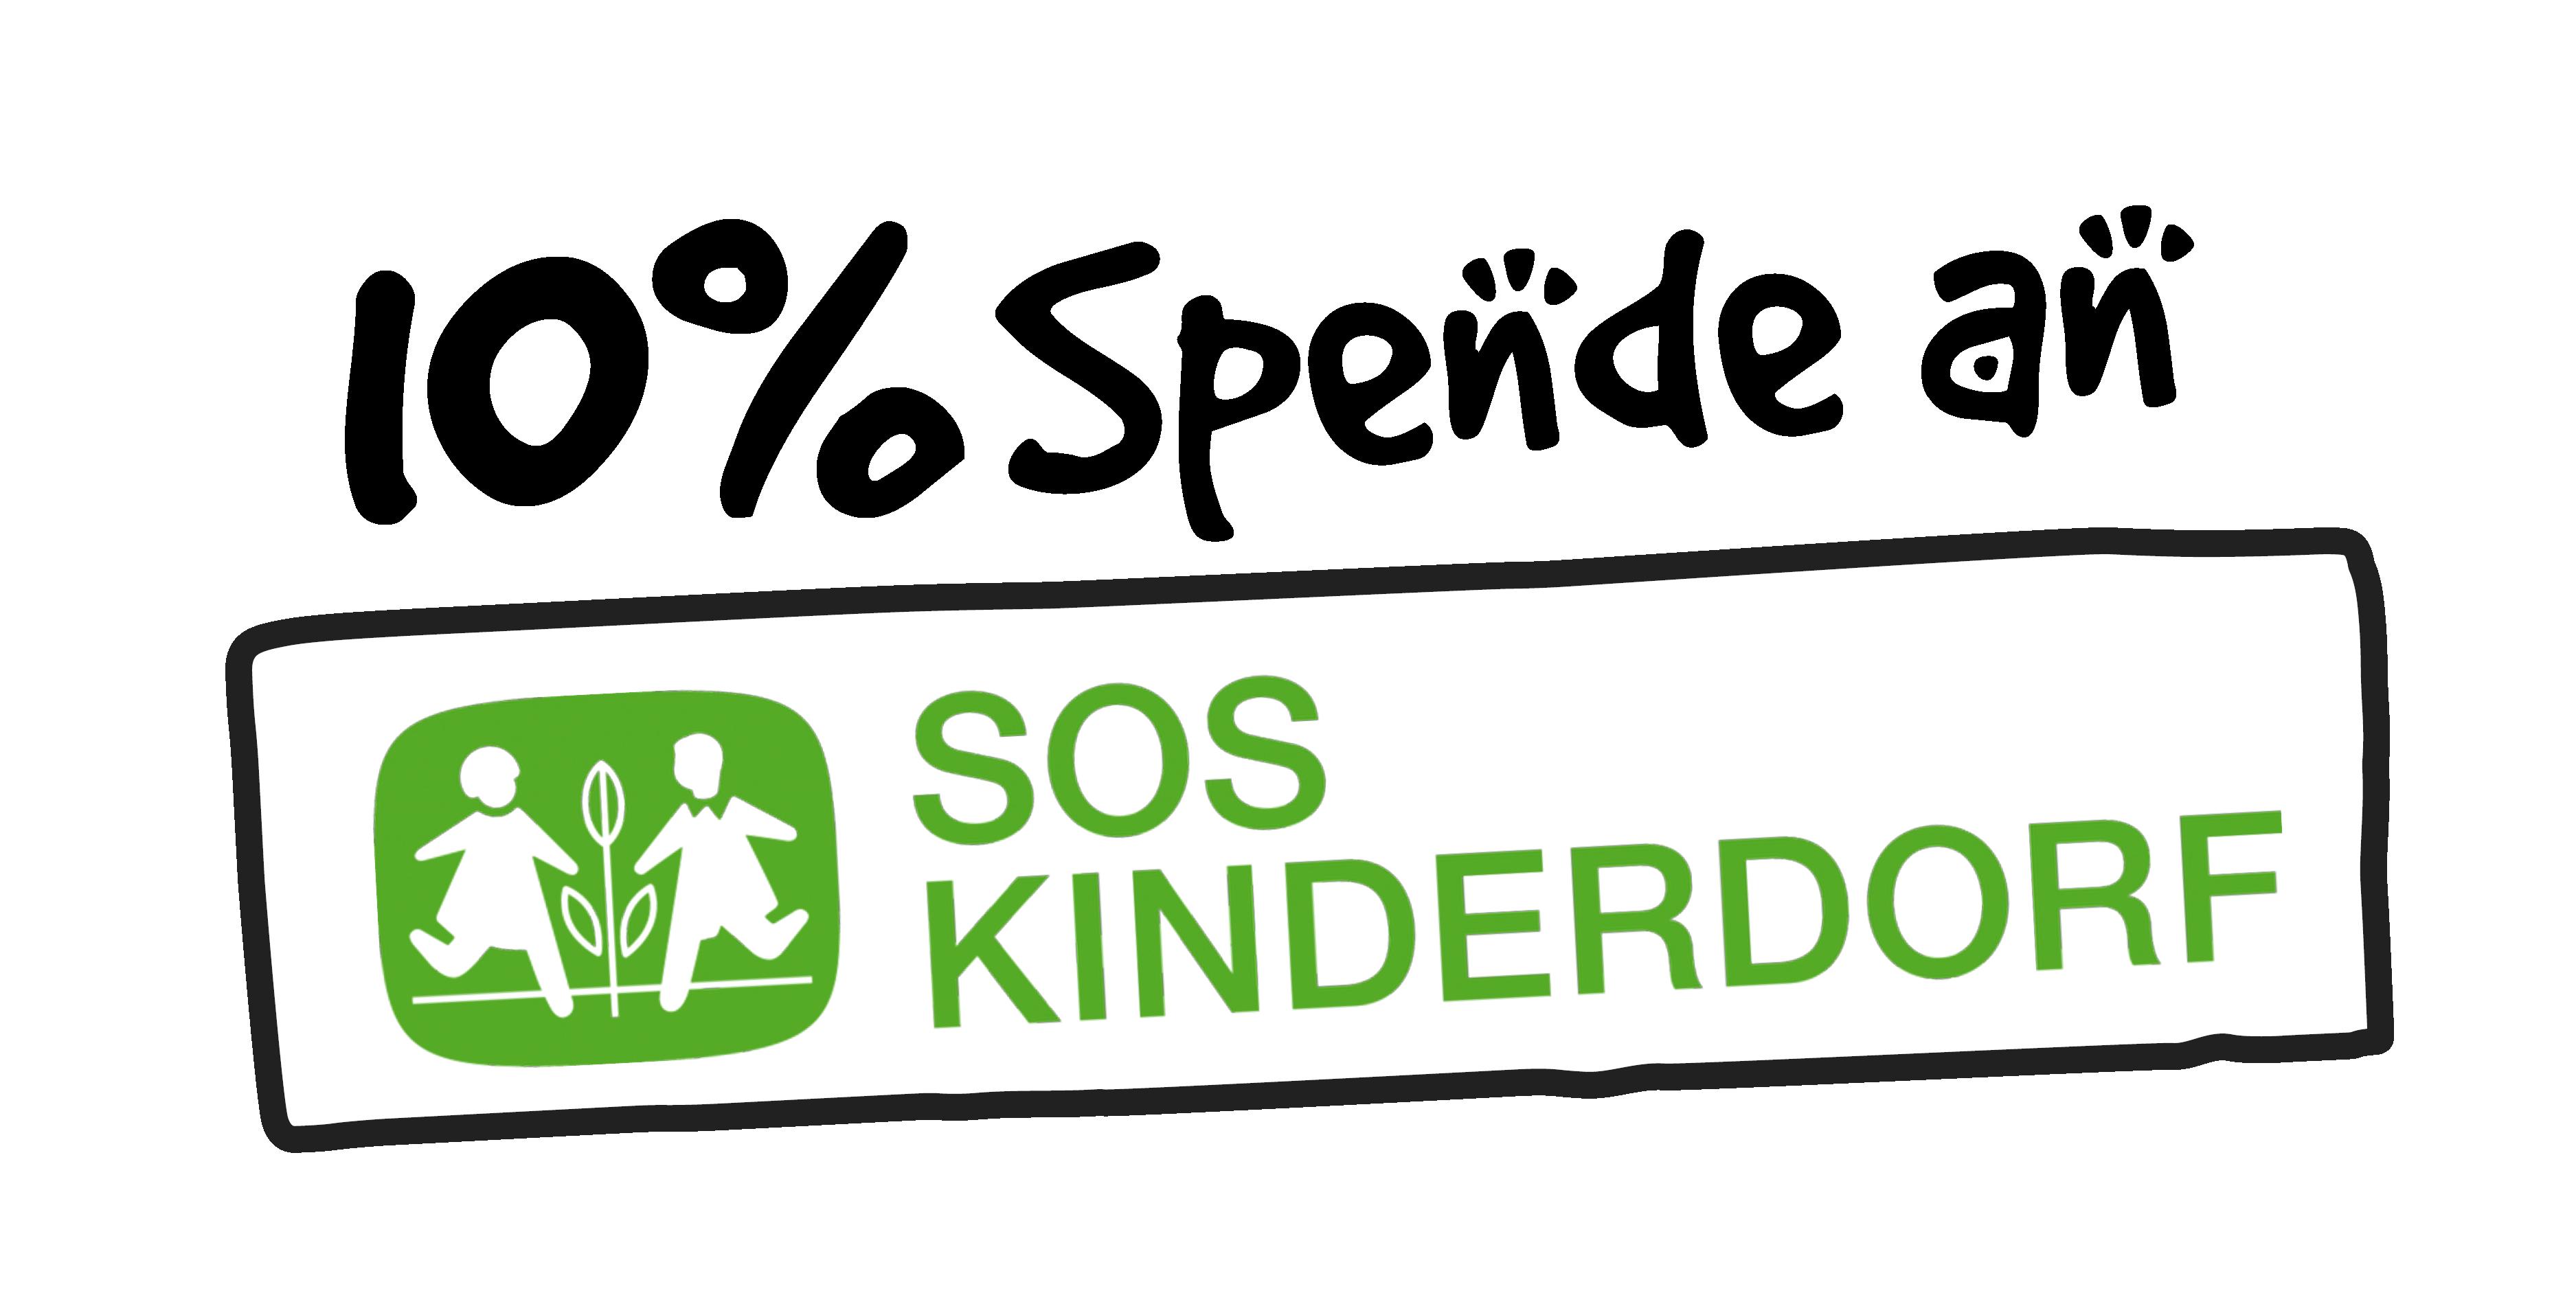 sos-kinderdorf logo bloggerflohmarkt nuernberg